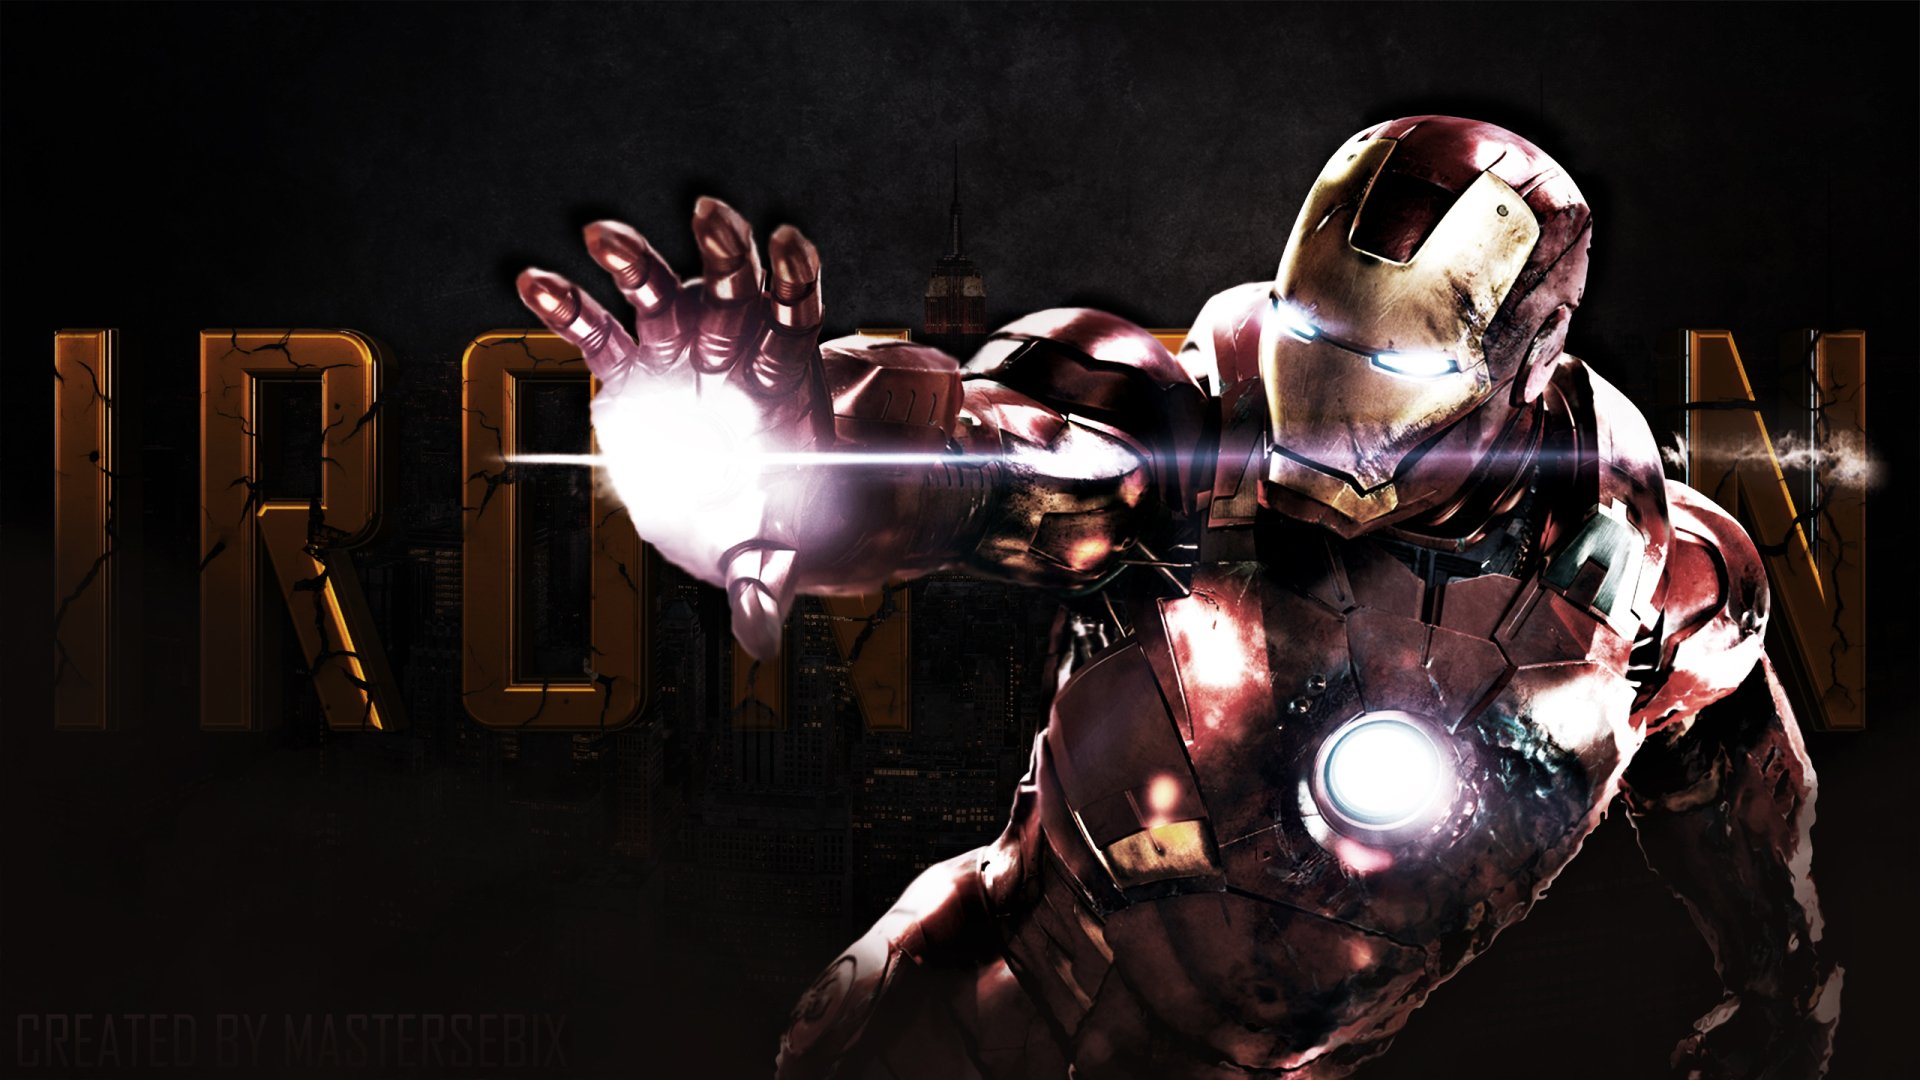 Iron Man Fond d'écran HD | Arrière-Plan | 2560x1440 | ID:397096 - Wallpaper Abyss